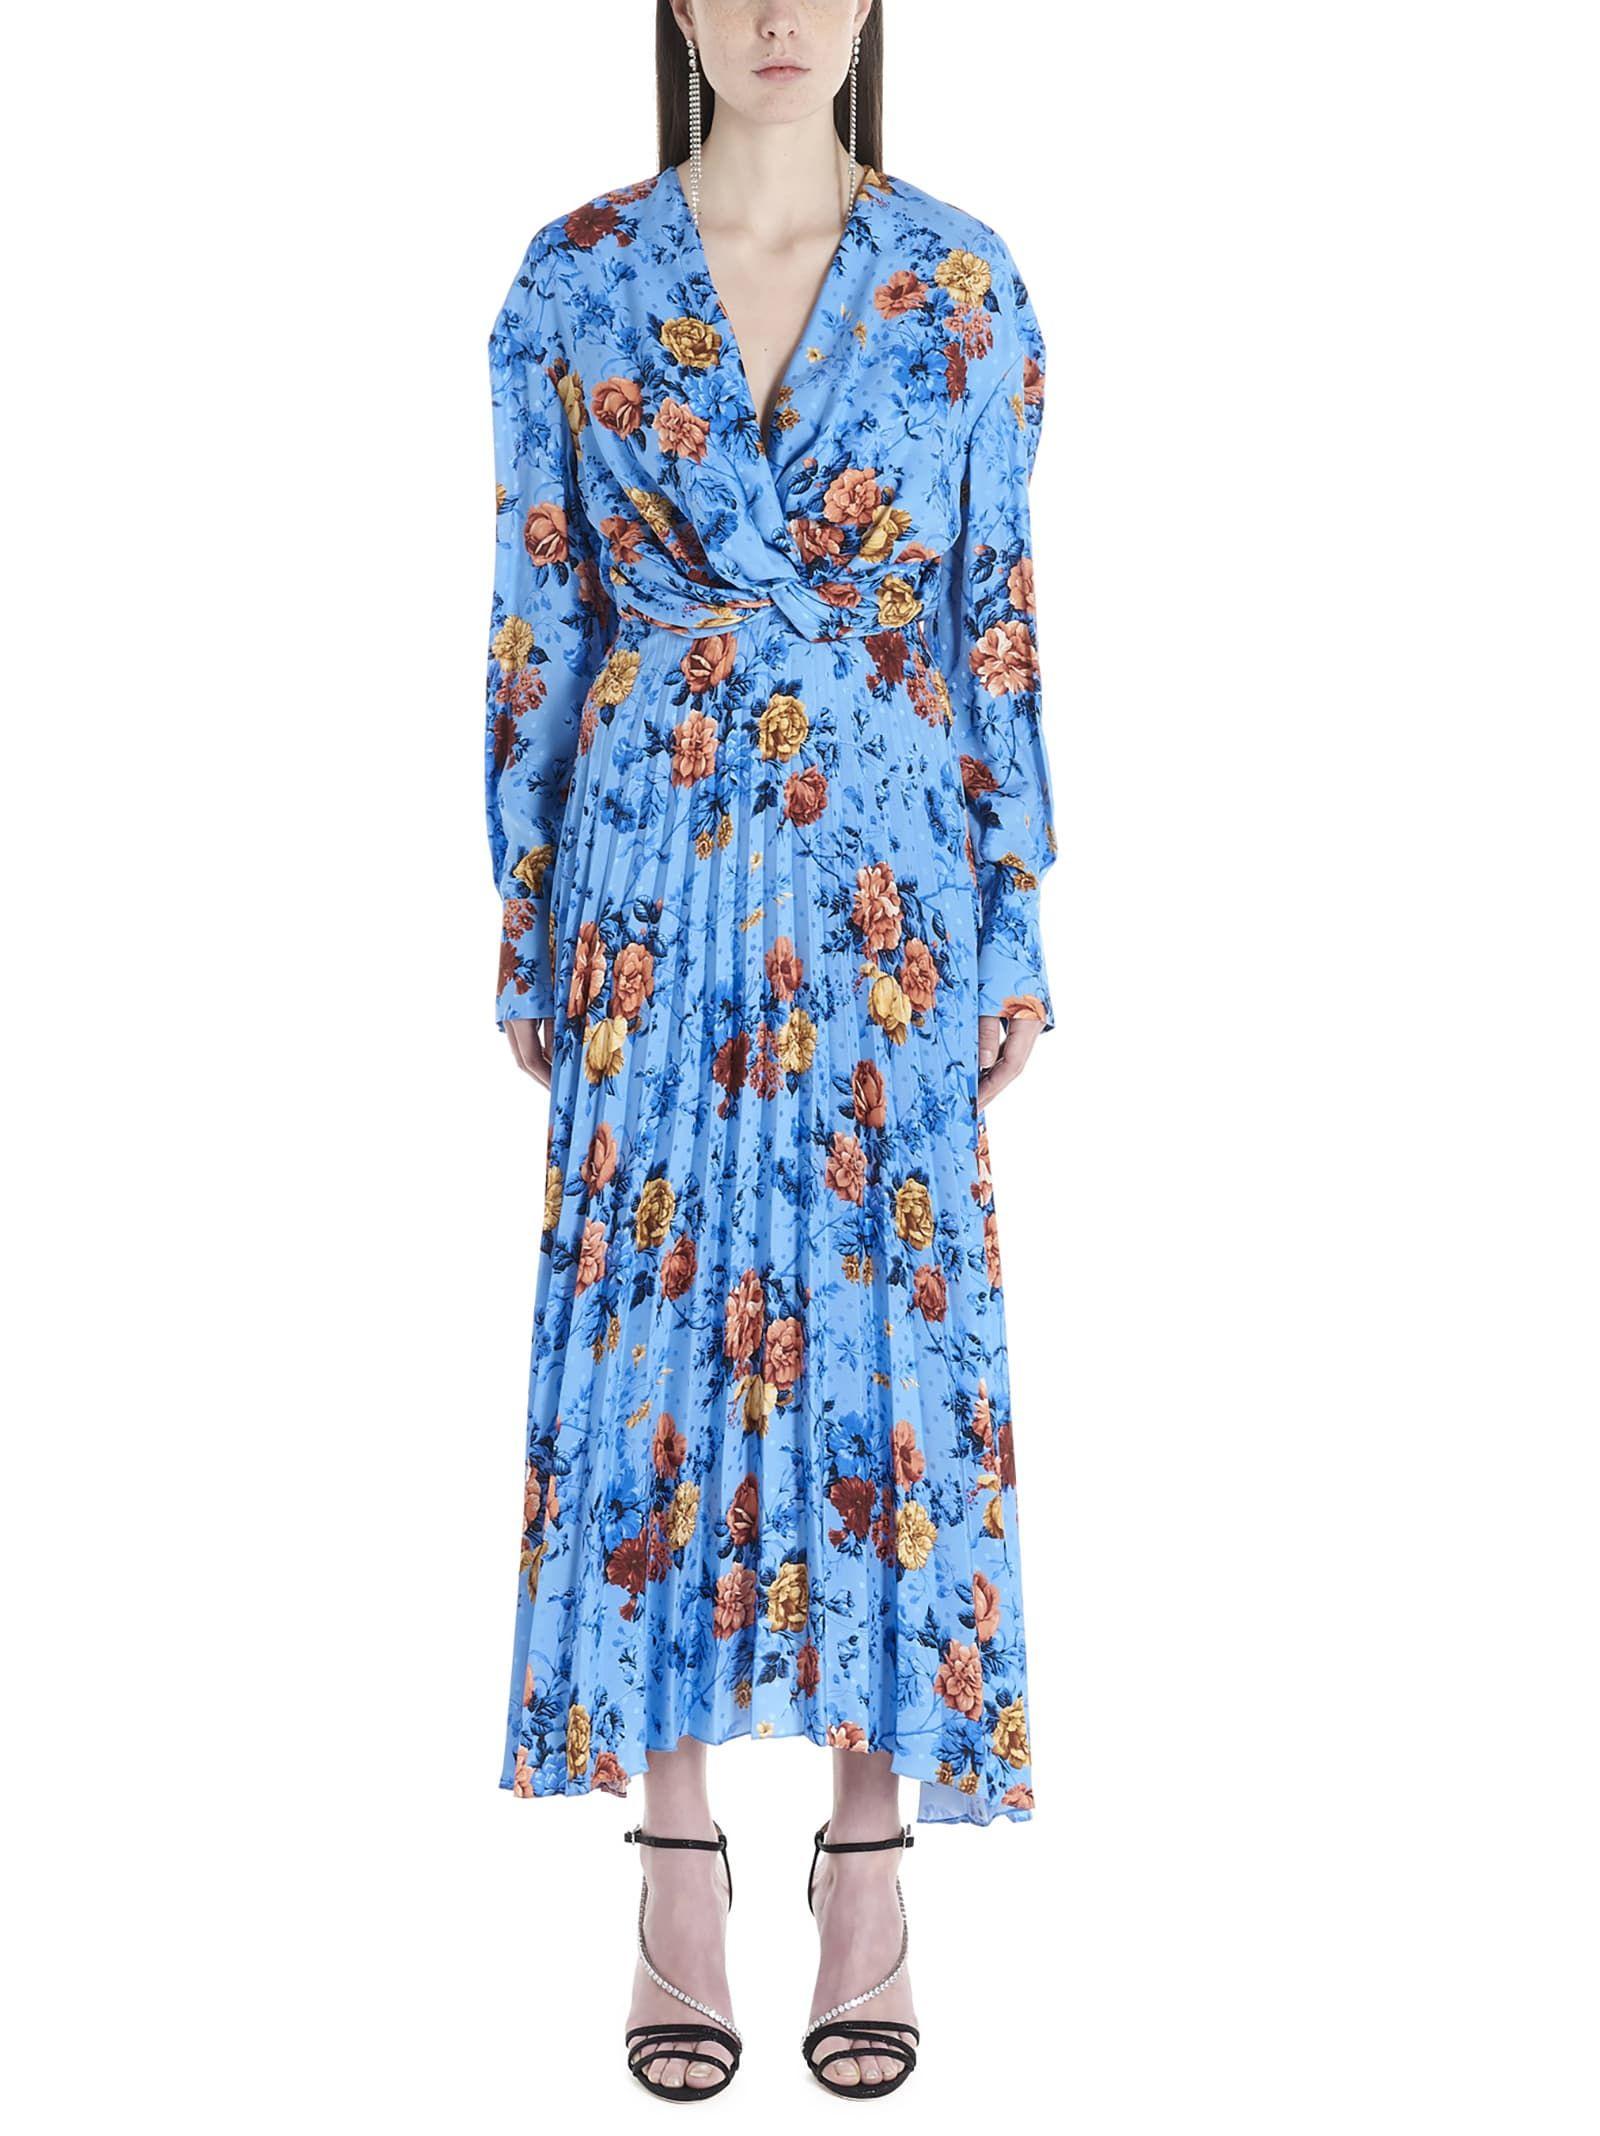 milano Dress From Magda Butrym:silk milano DressComposition: 100% silk